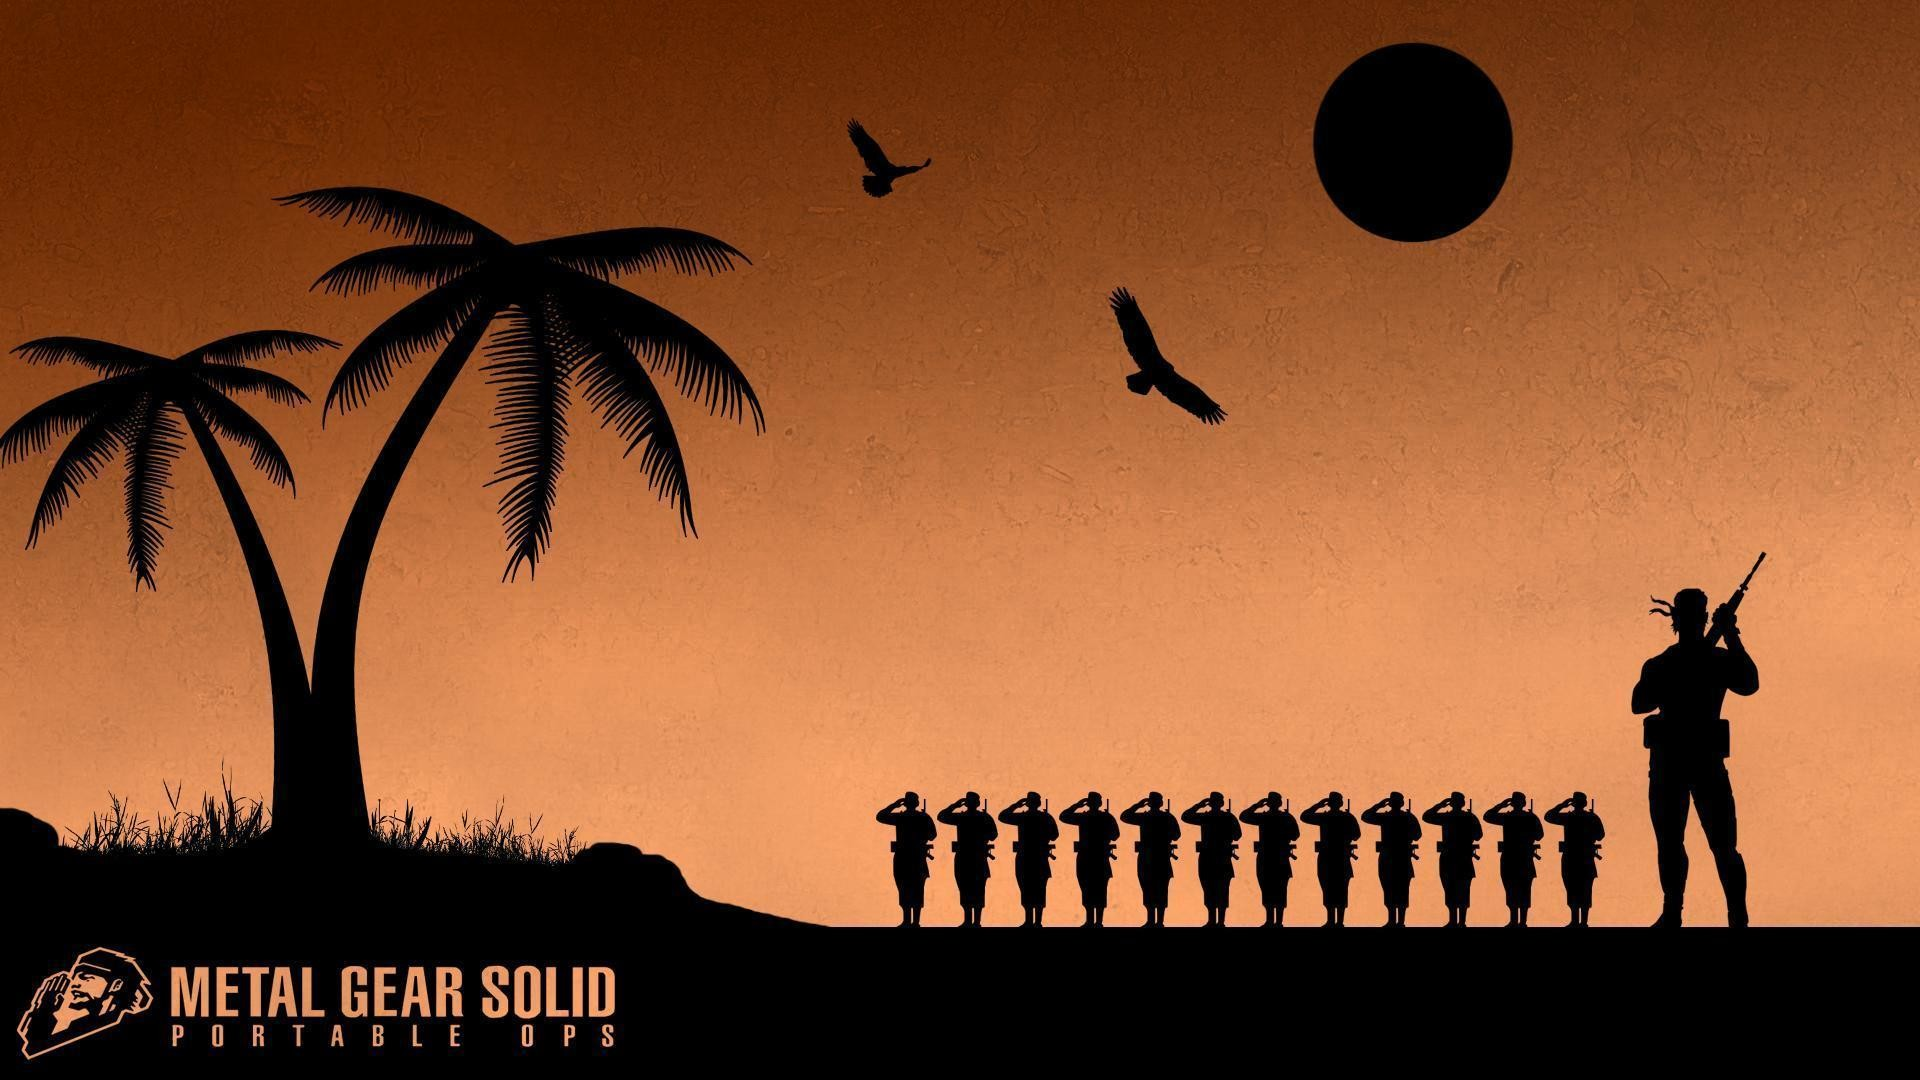 2 Metal Gear Solid: Portable Ops Wallpapers | Metal Gear Solid .